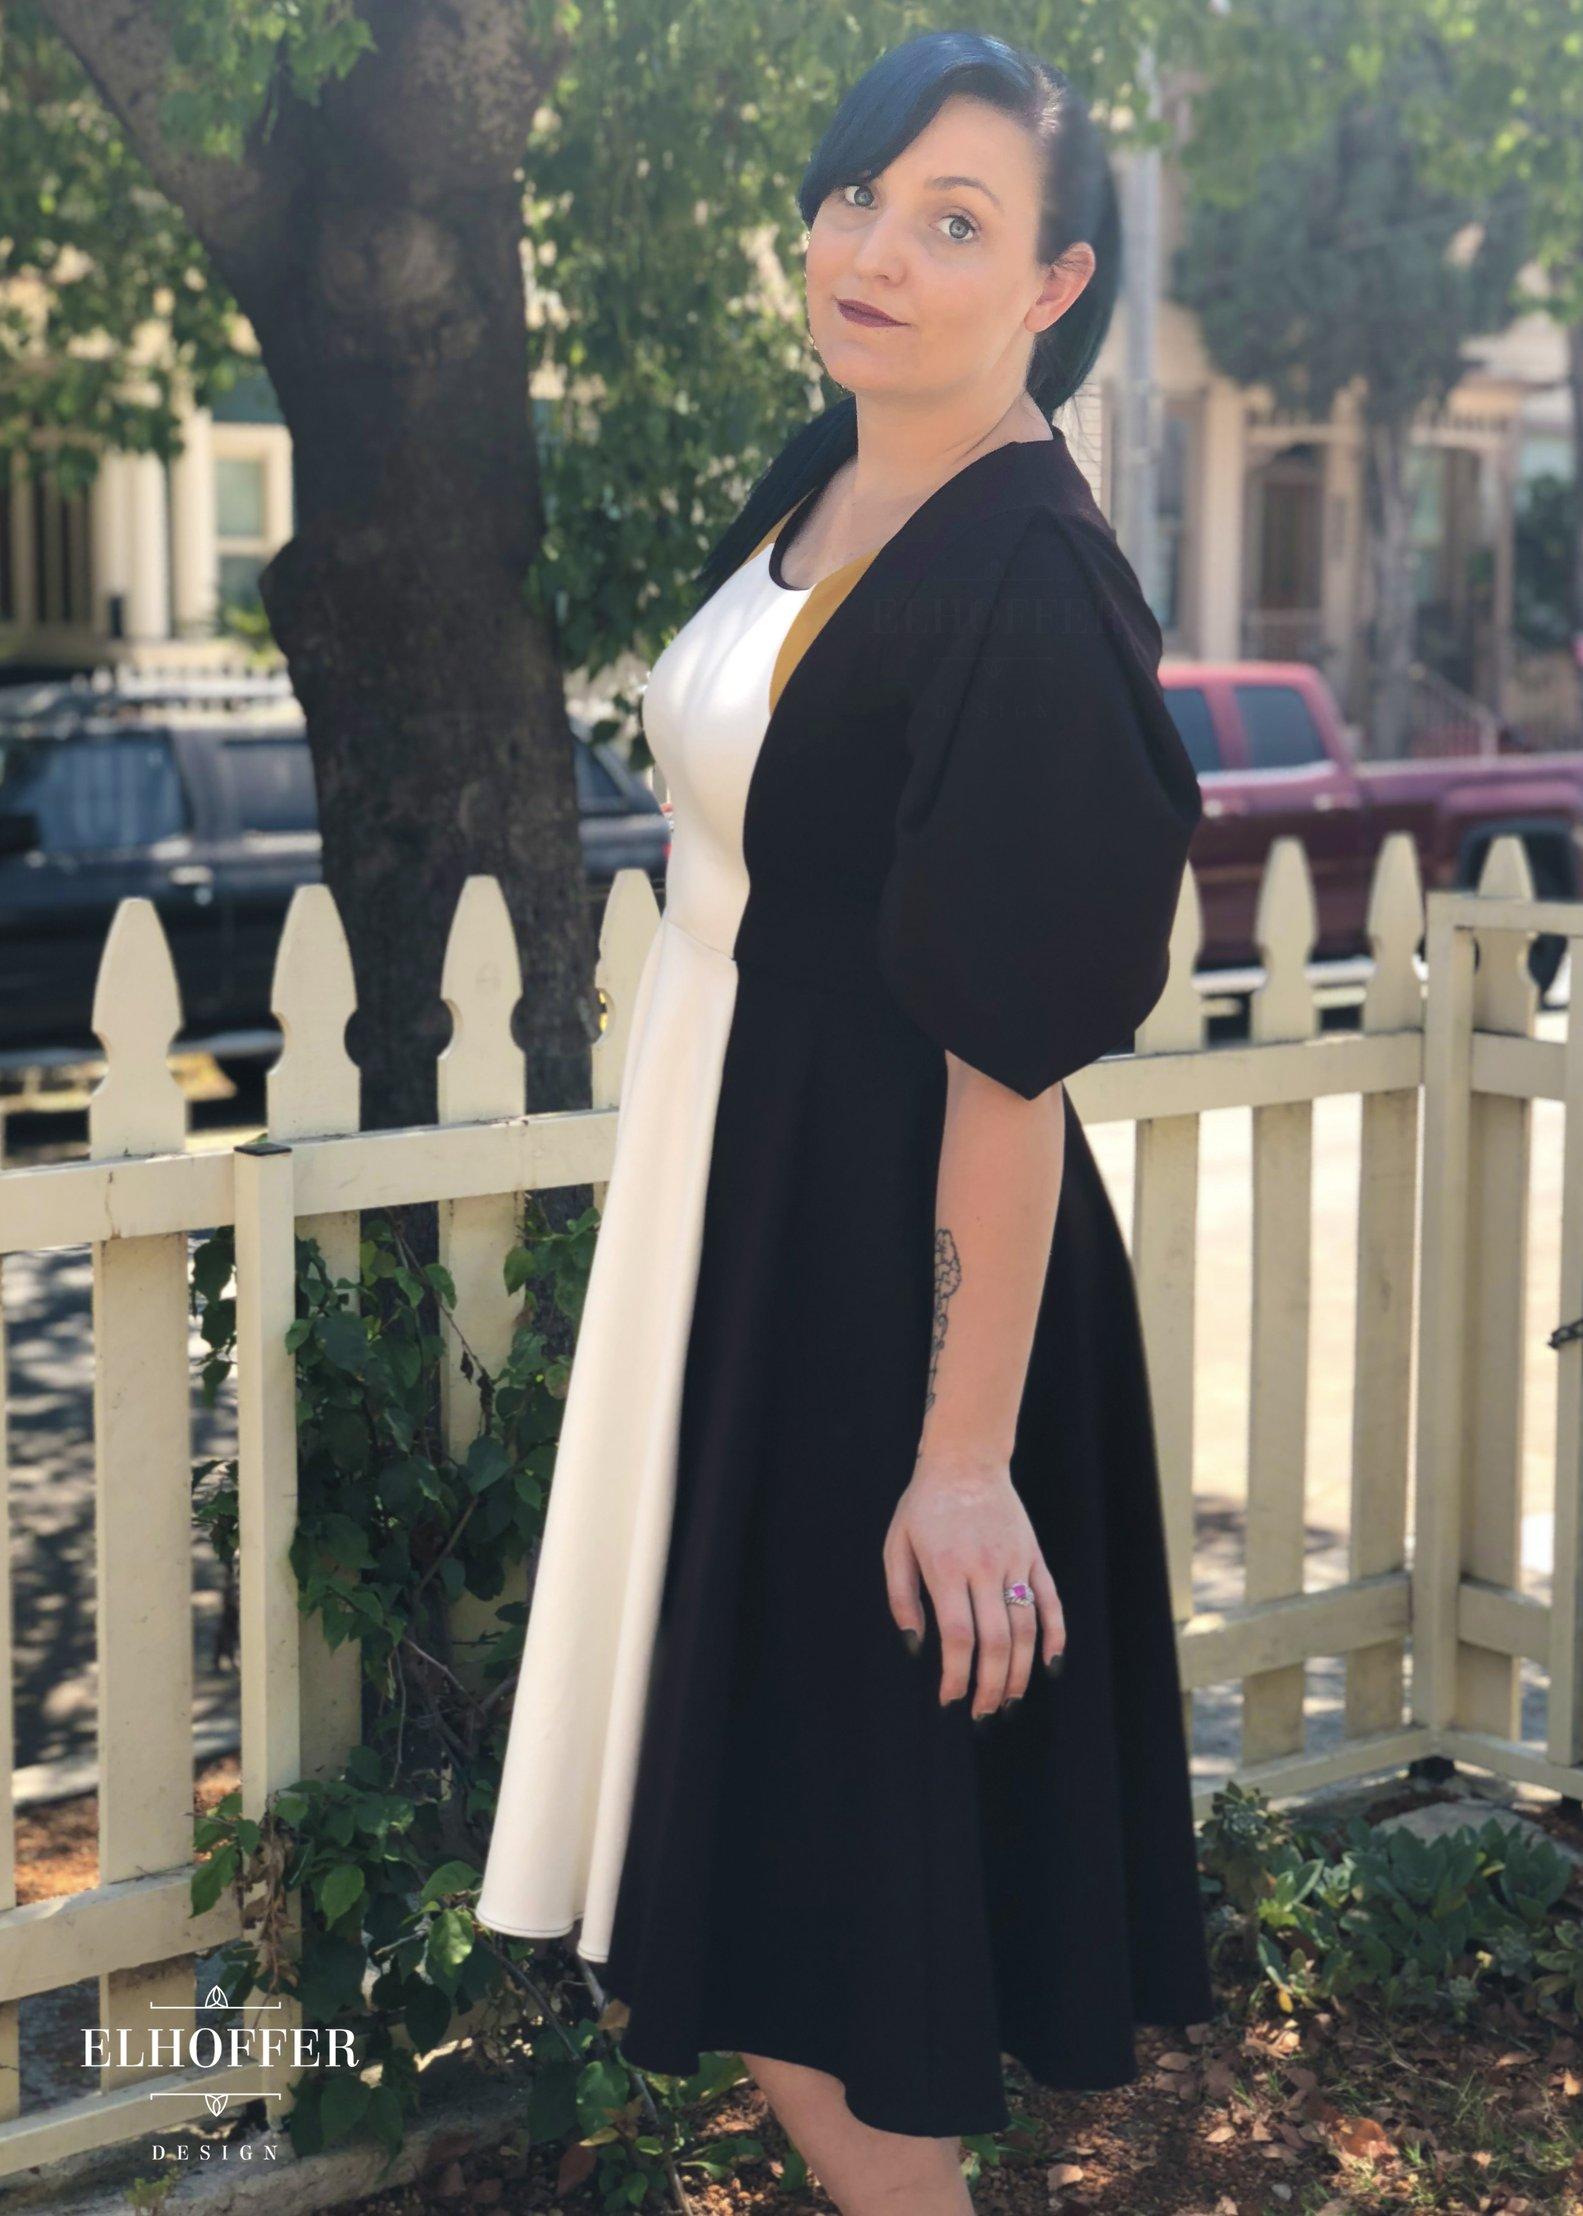 Elhoffer Design - Star Wars The Last Porg Inspired Galactic Puffin Dress